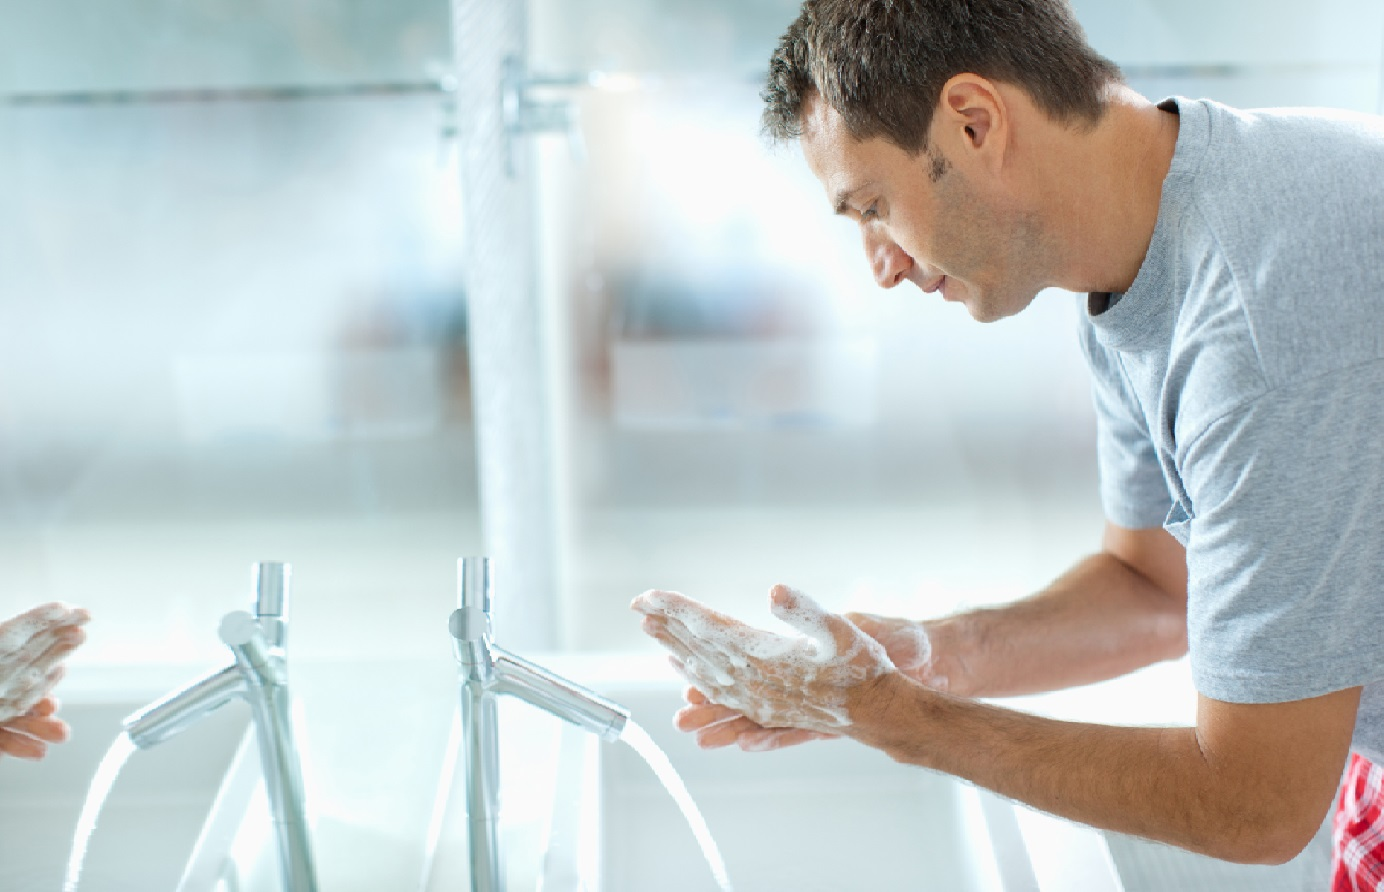 lavage mains hommes (istock - payée) (v